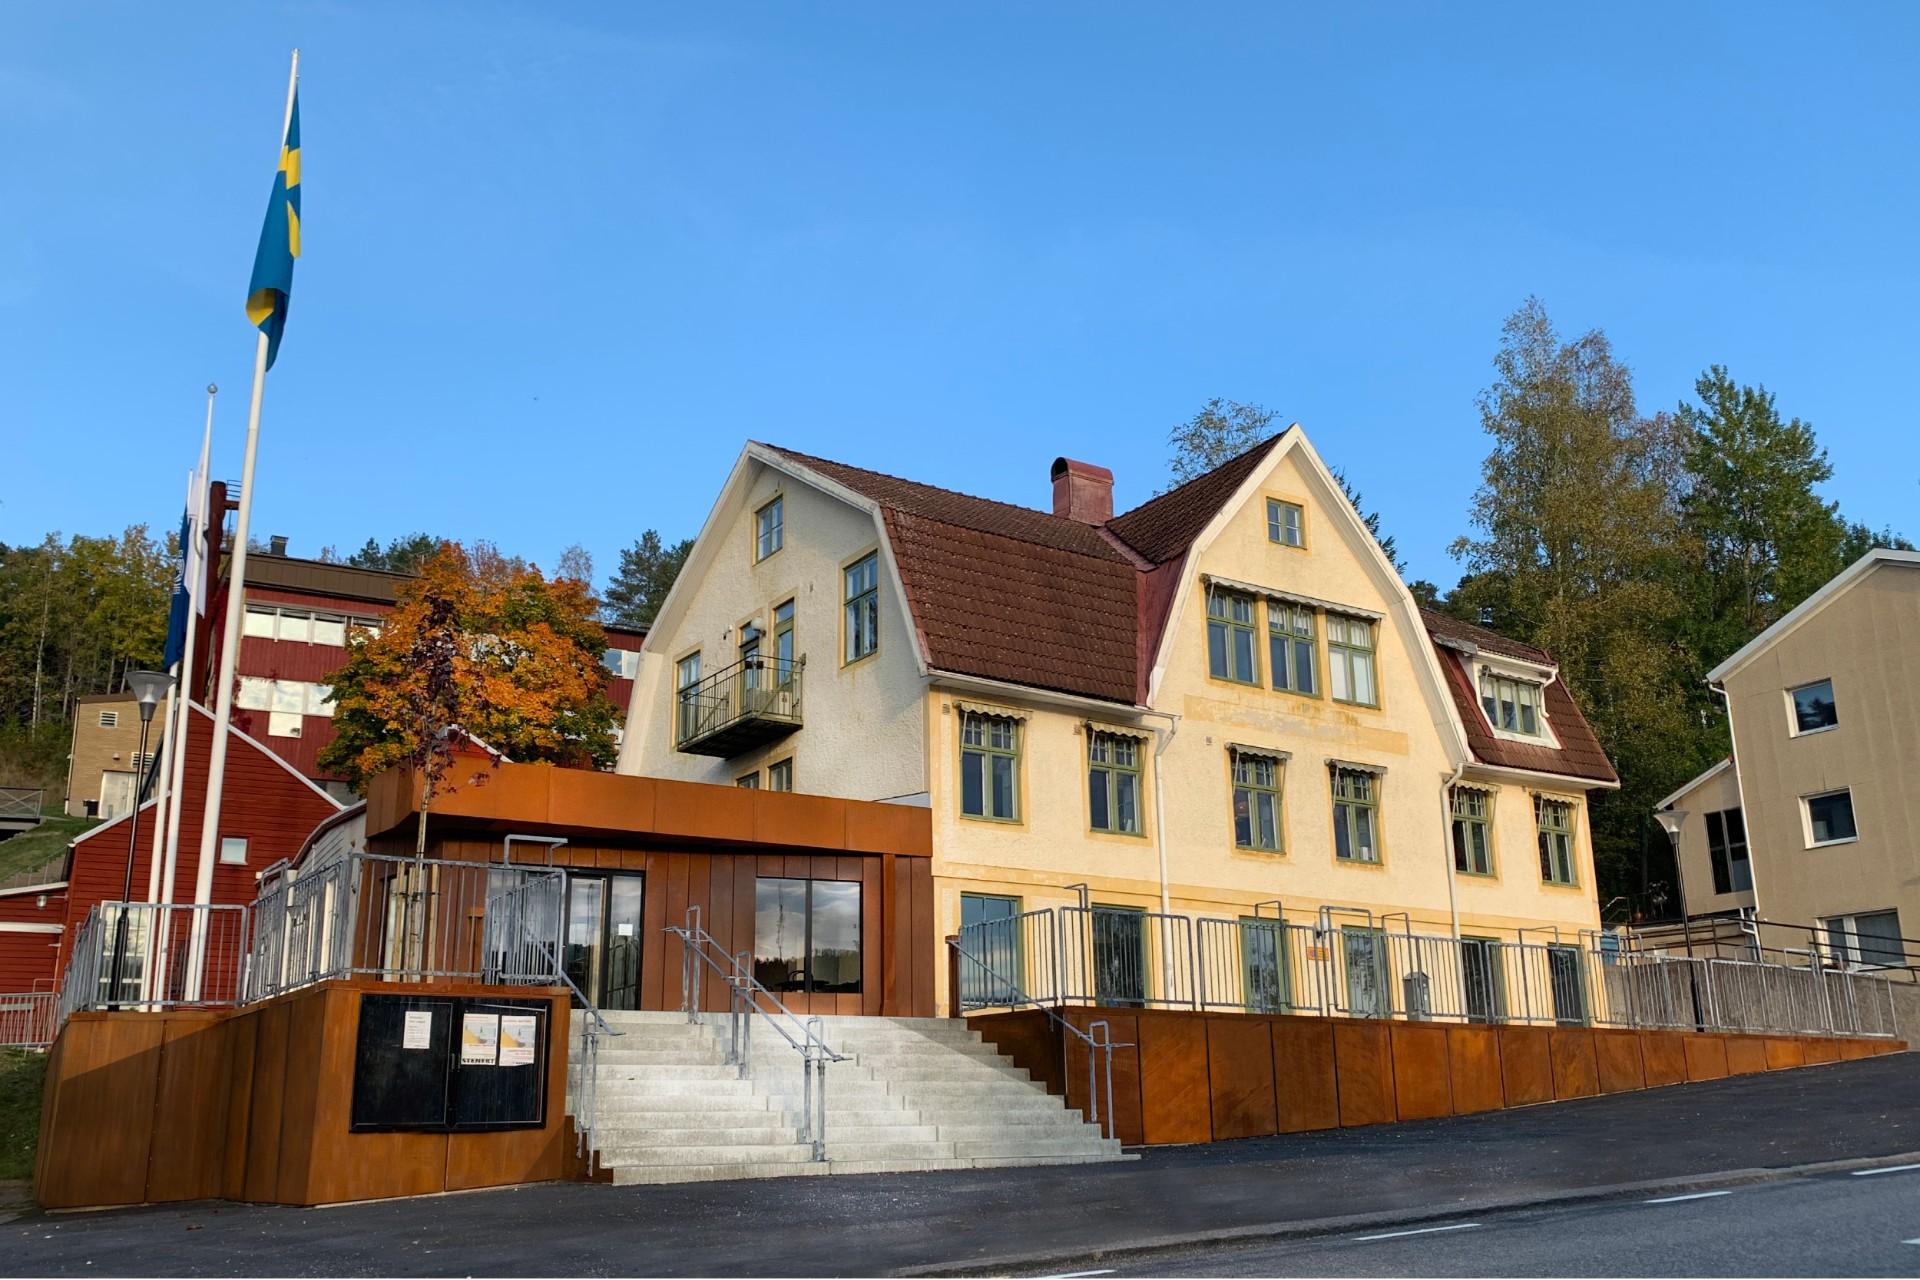 esteneby-dals-folkbibliotek8